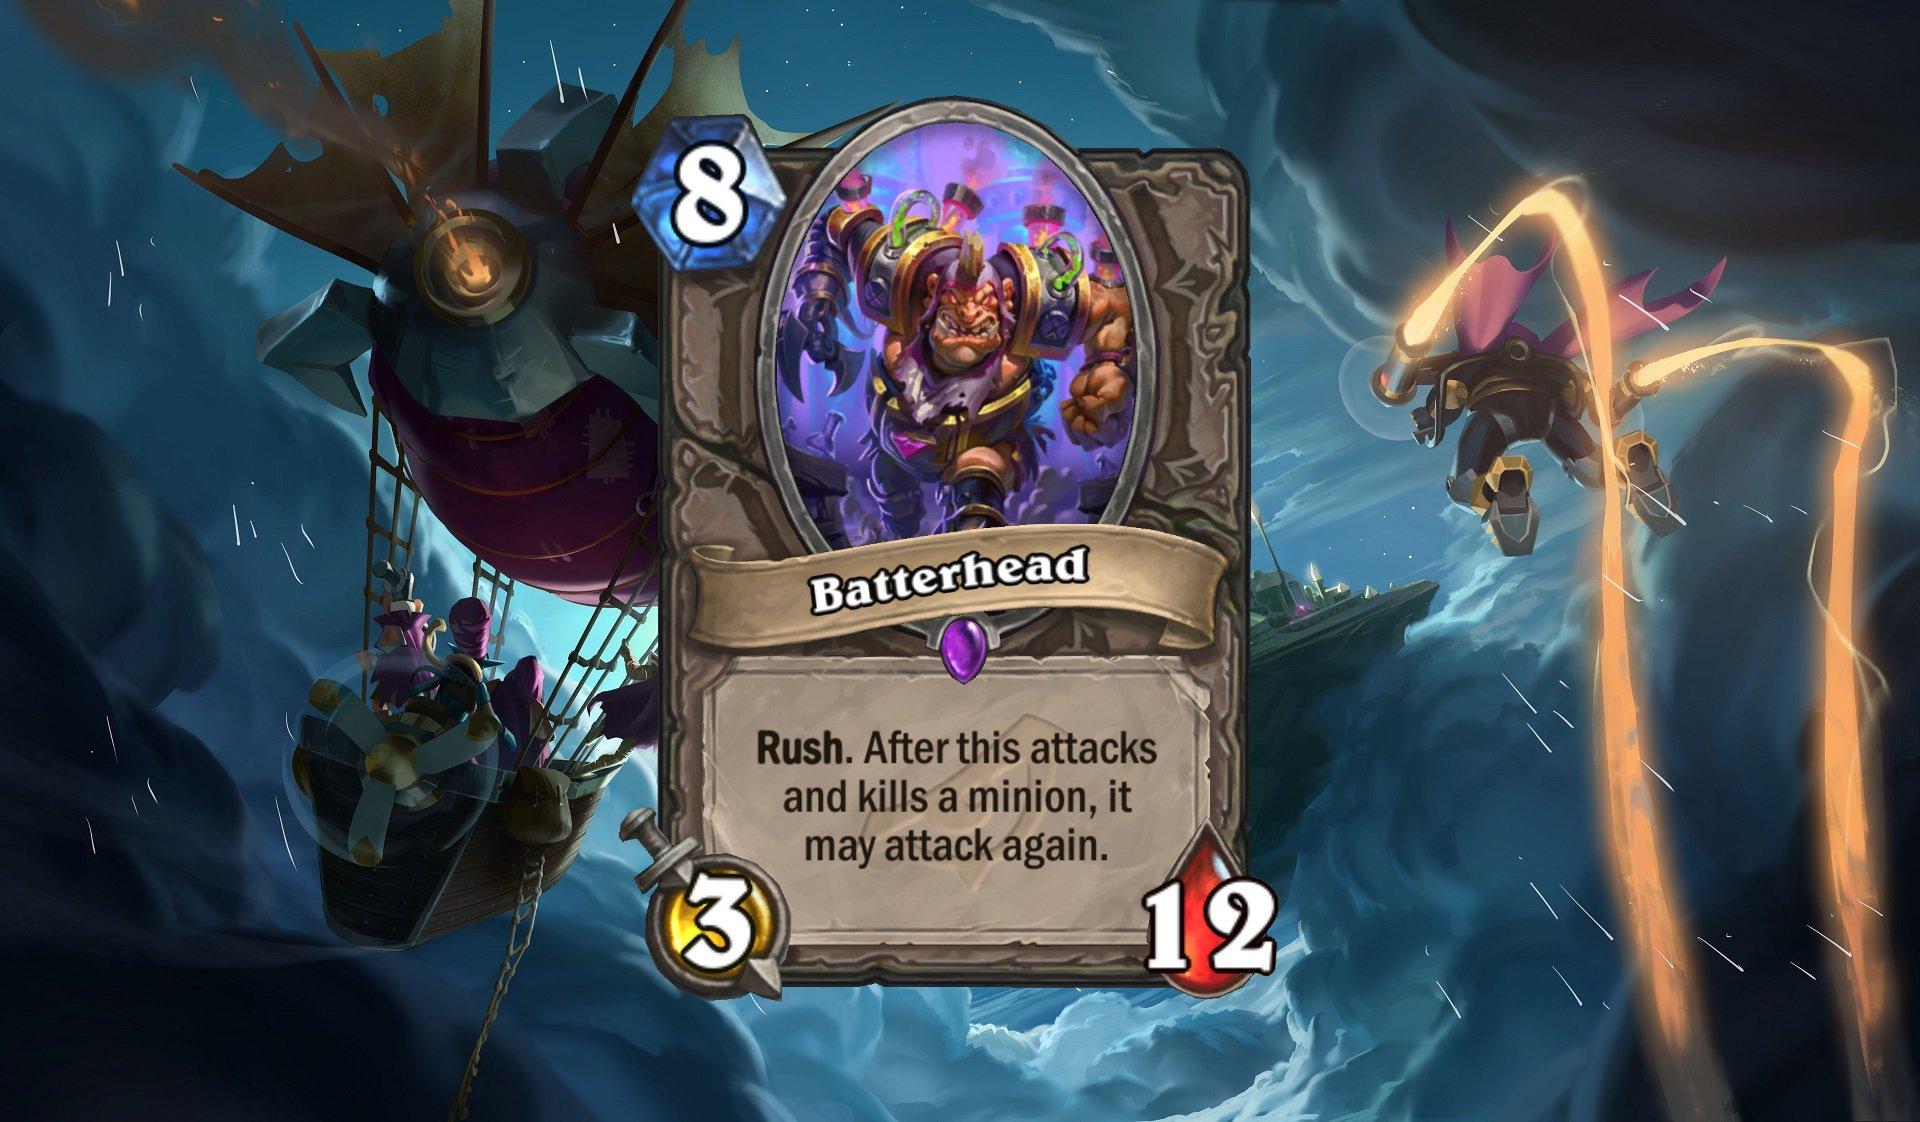 Batterhead